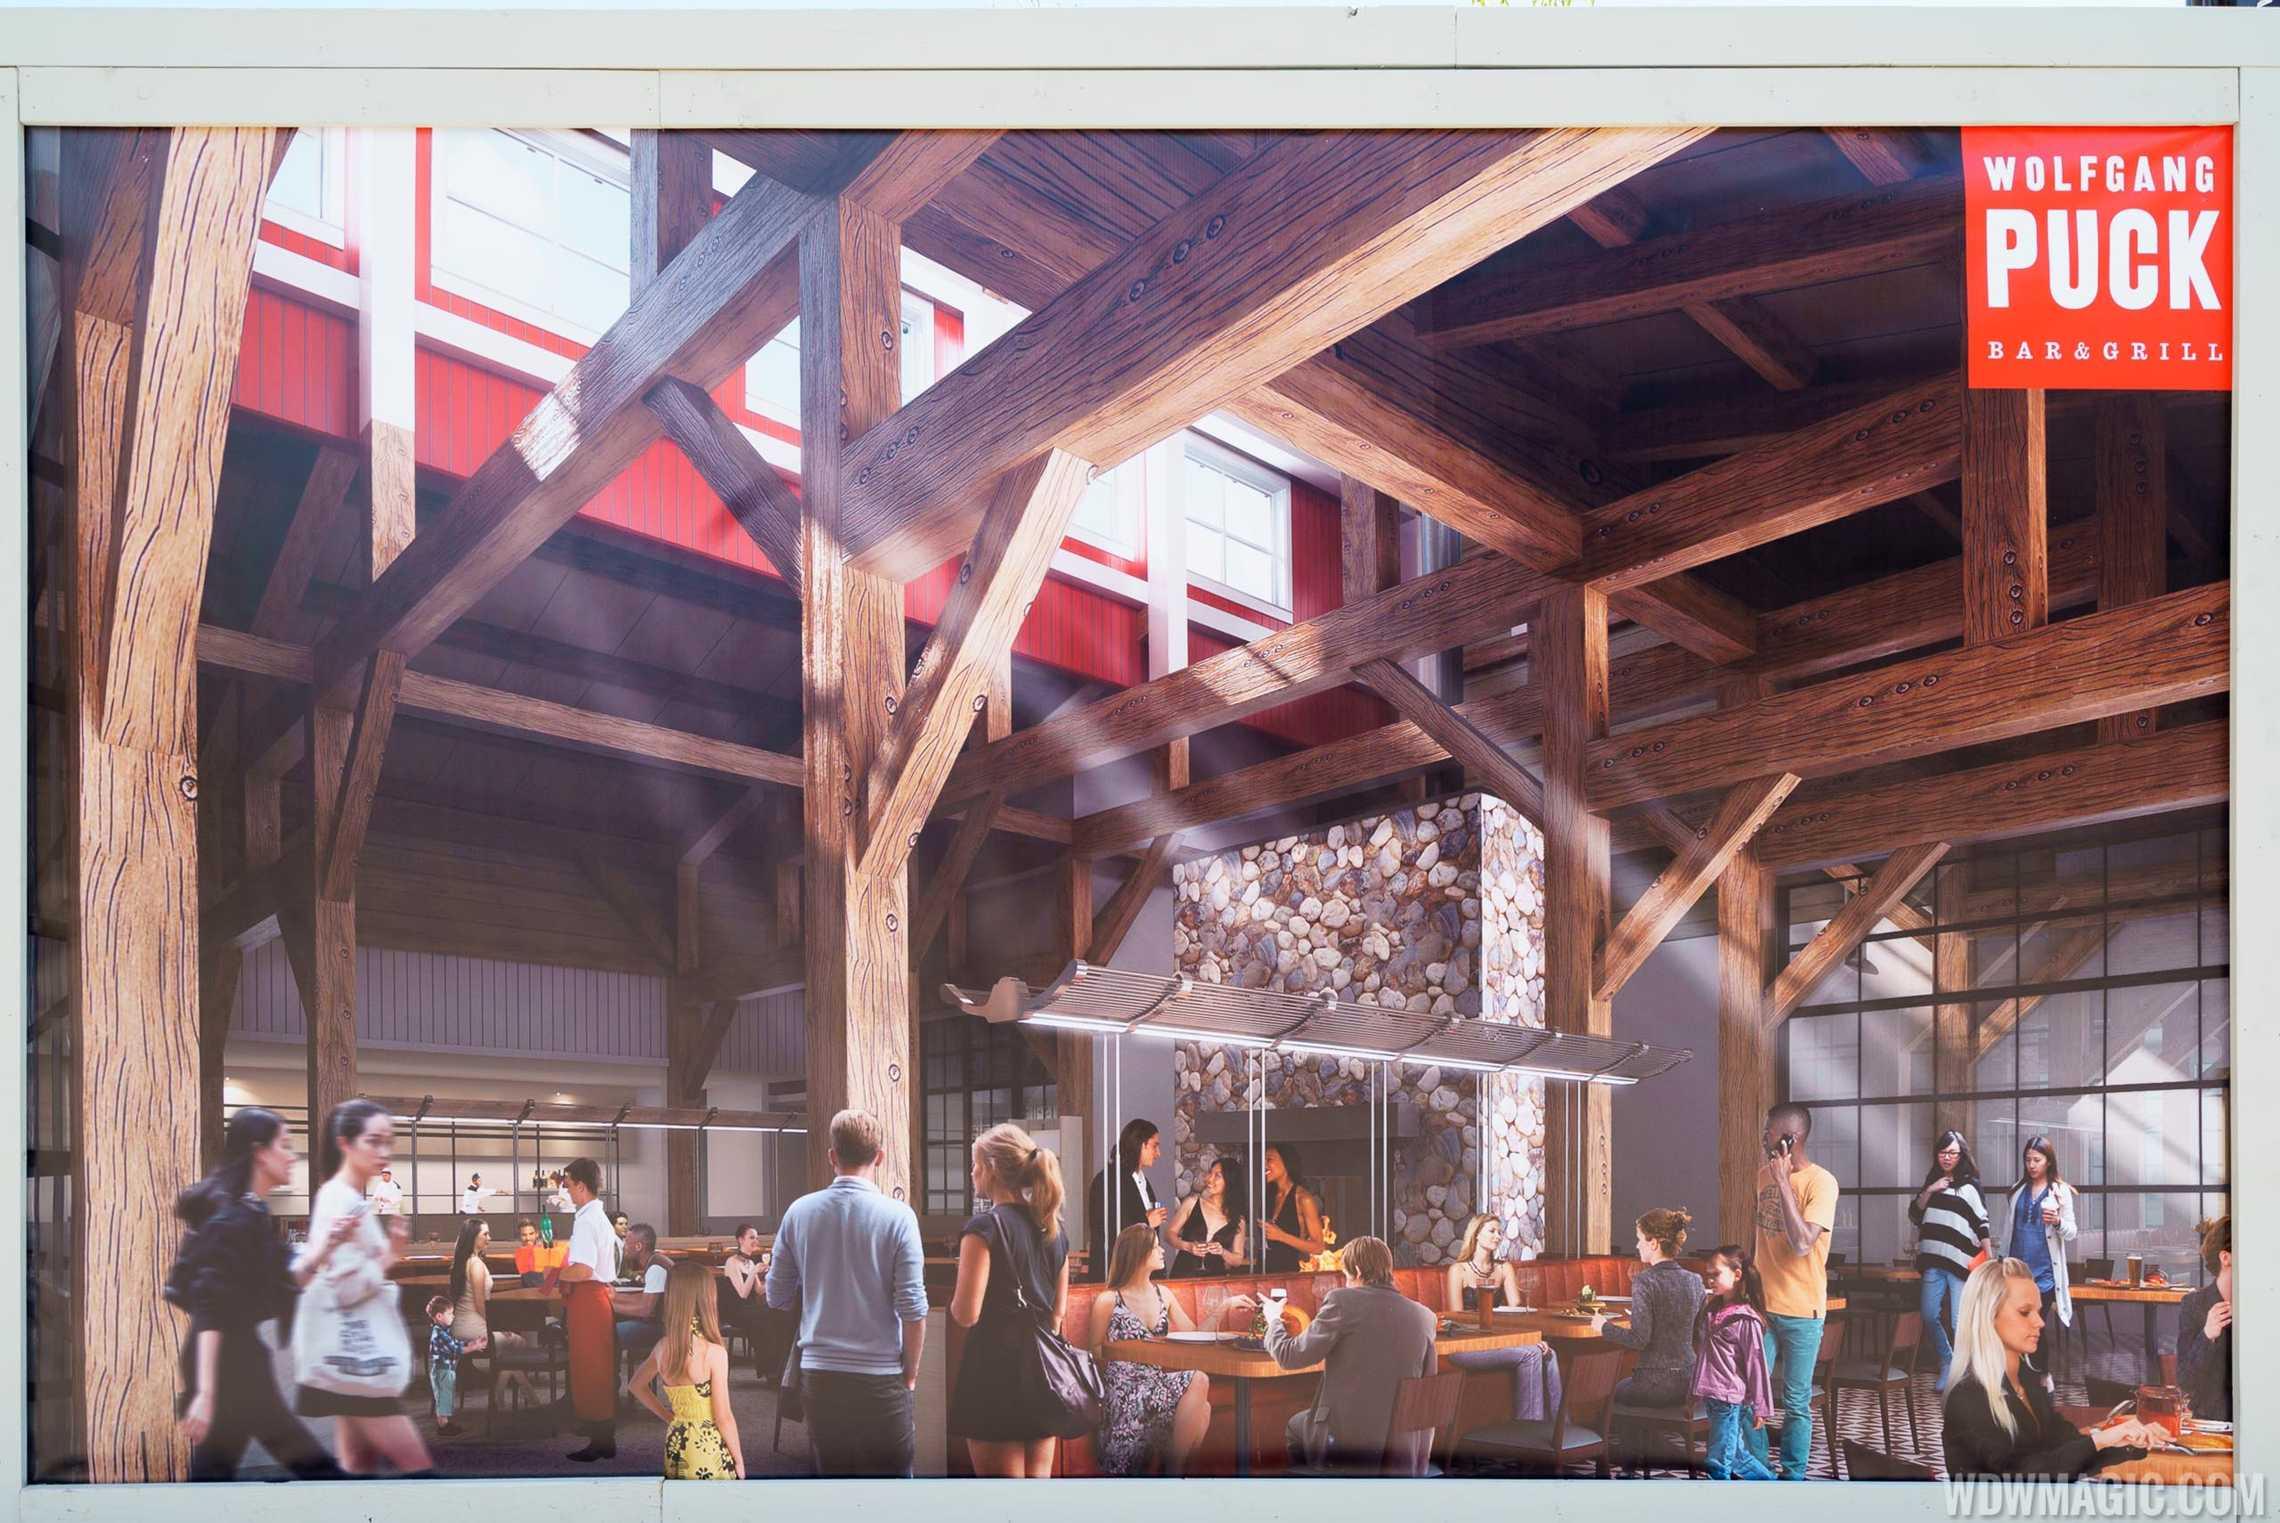 Wolfgang Puck Bar and Grill concept art - Interior